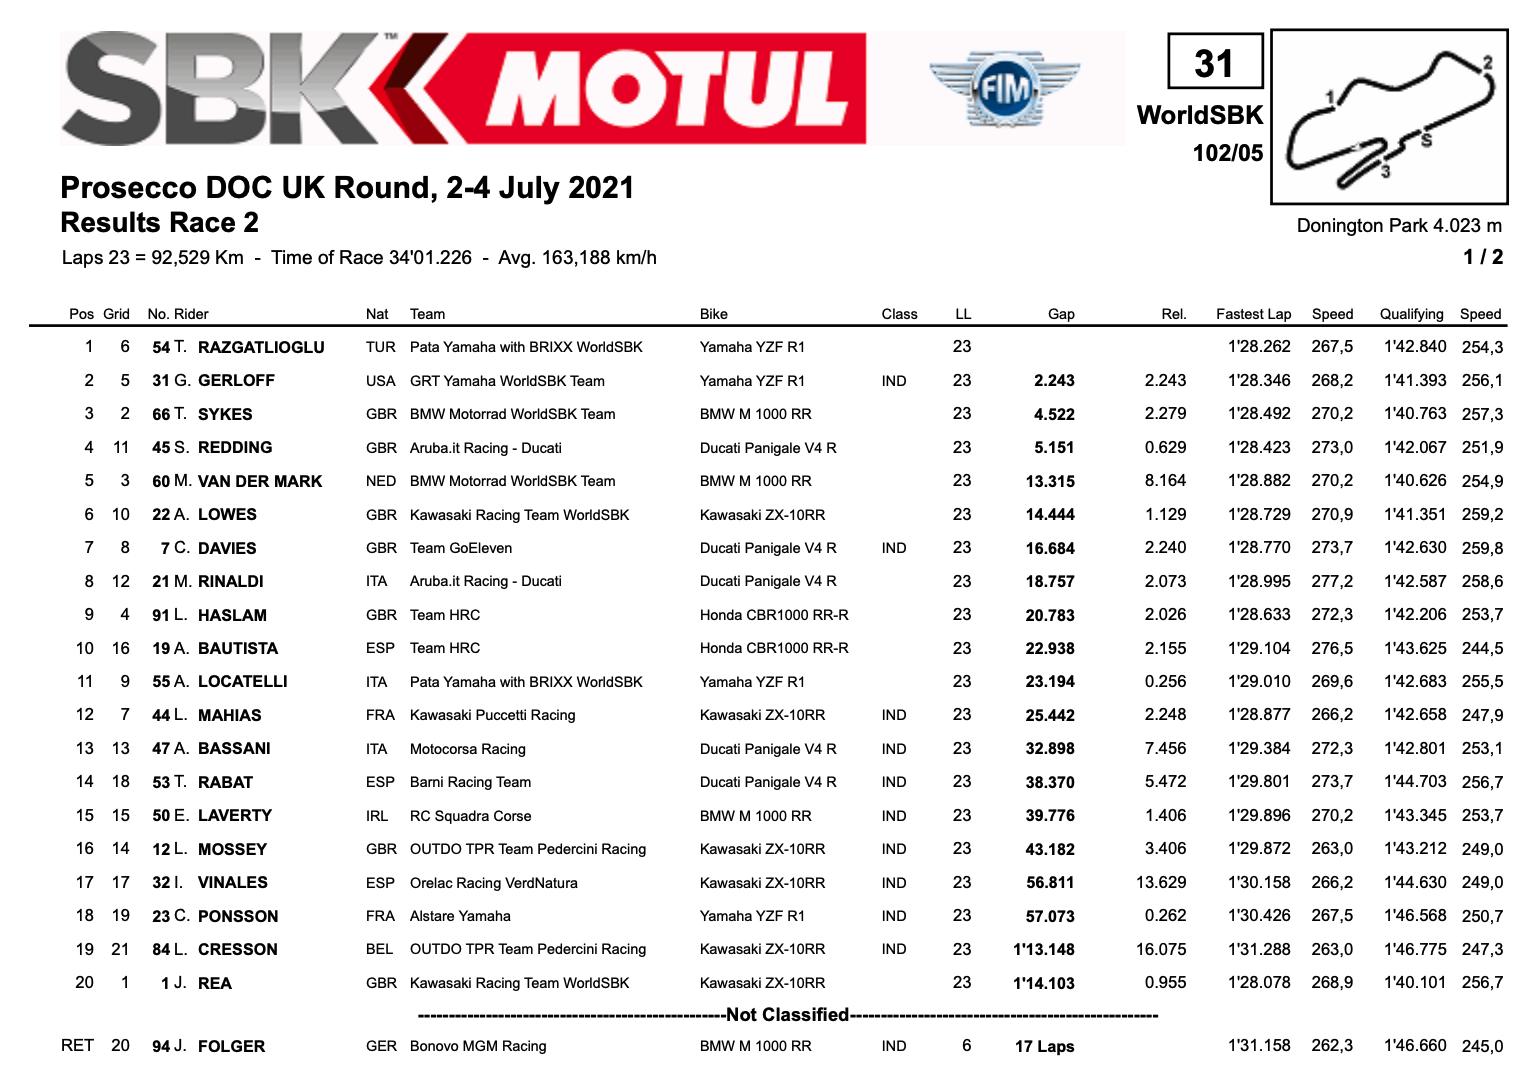 FIM スーパーバイク世界選手権(SBK)イギリス戦 レース2でトプラック・ラズガトリオグルが優勝